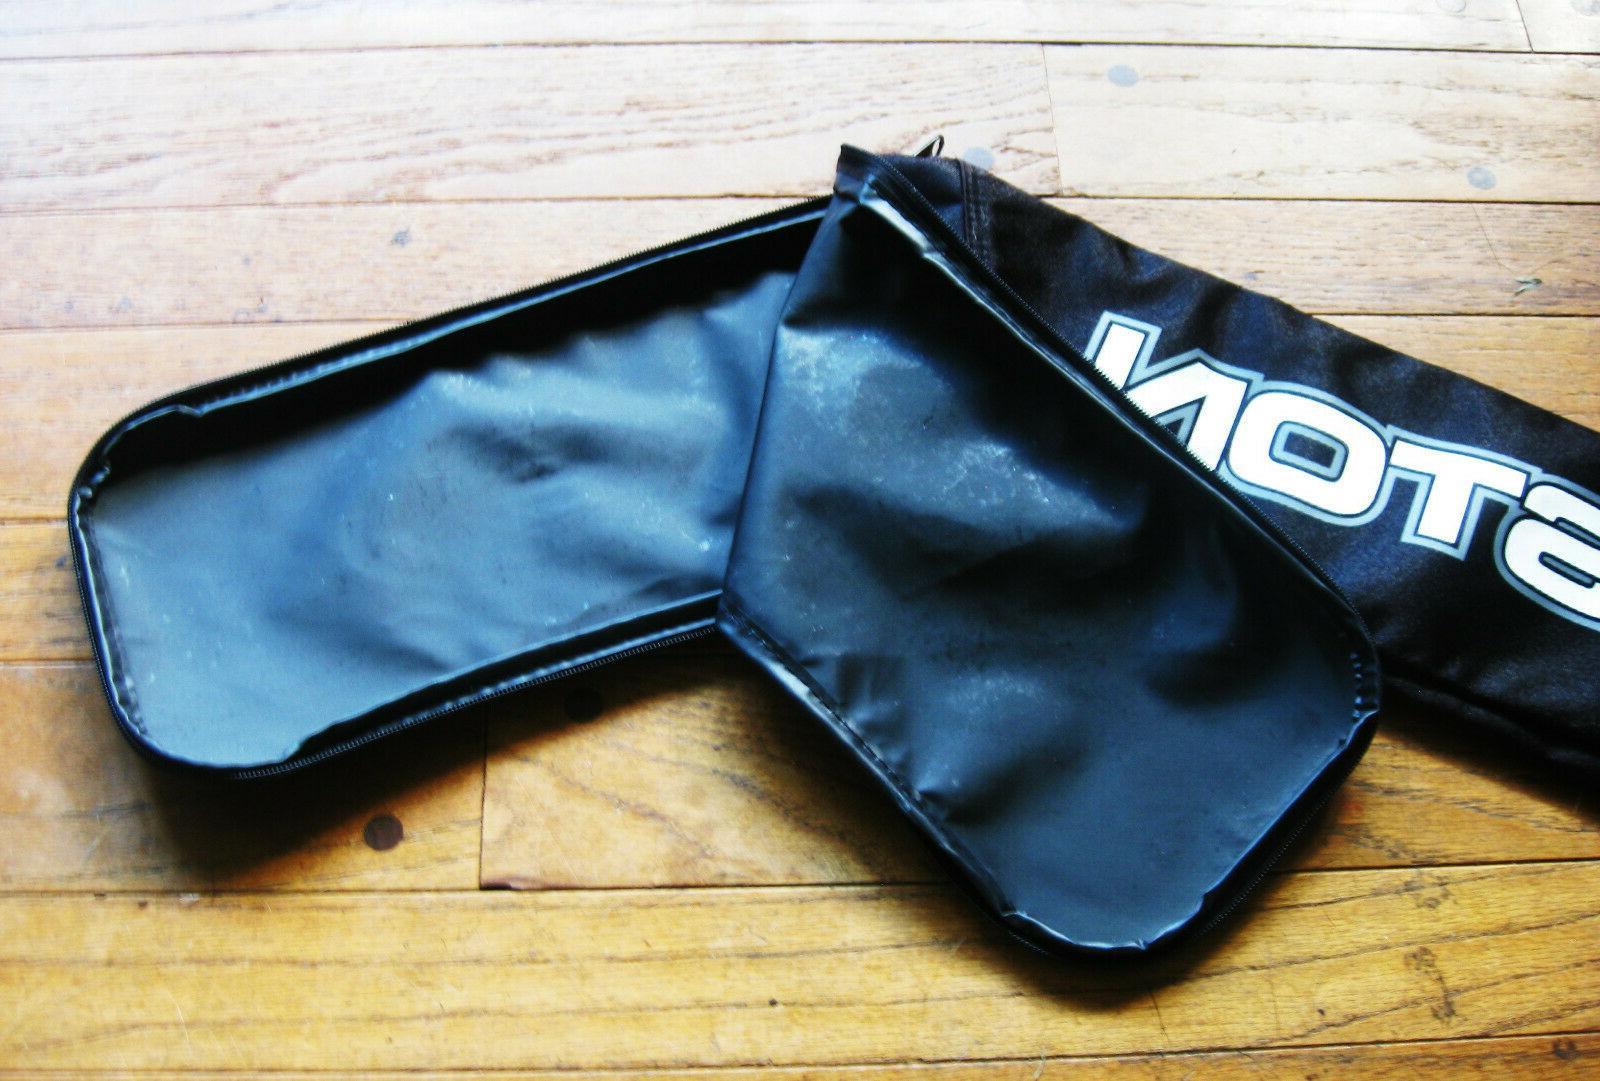 Easton Hockey Bag, Length, blade